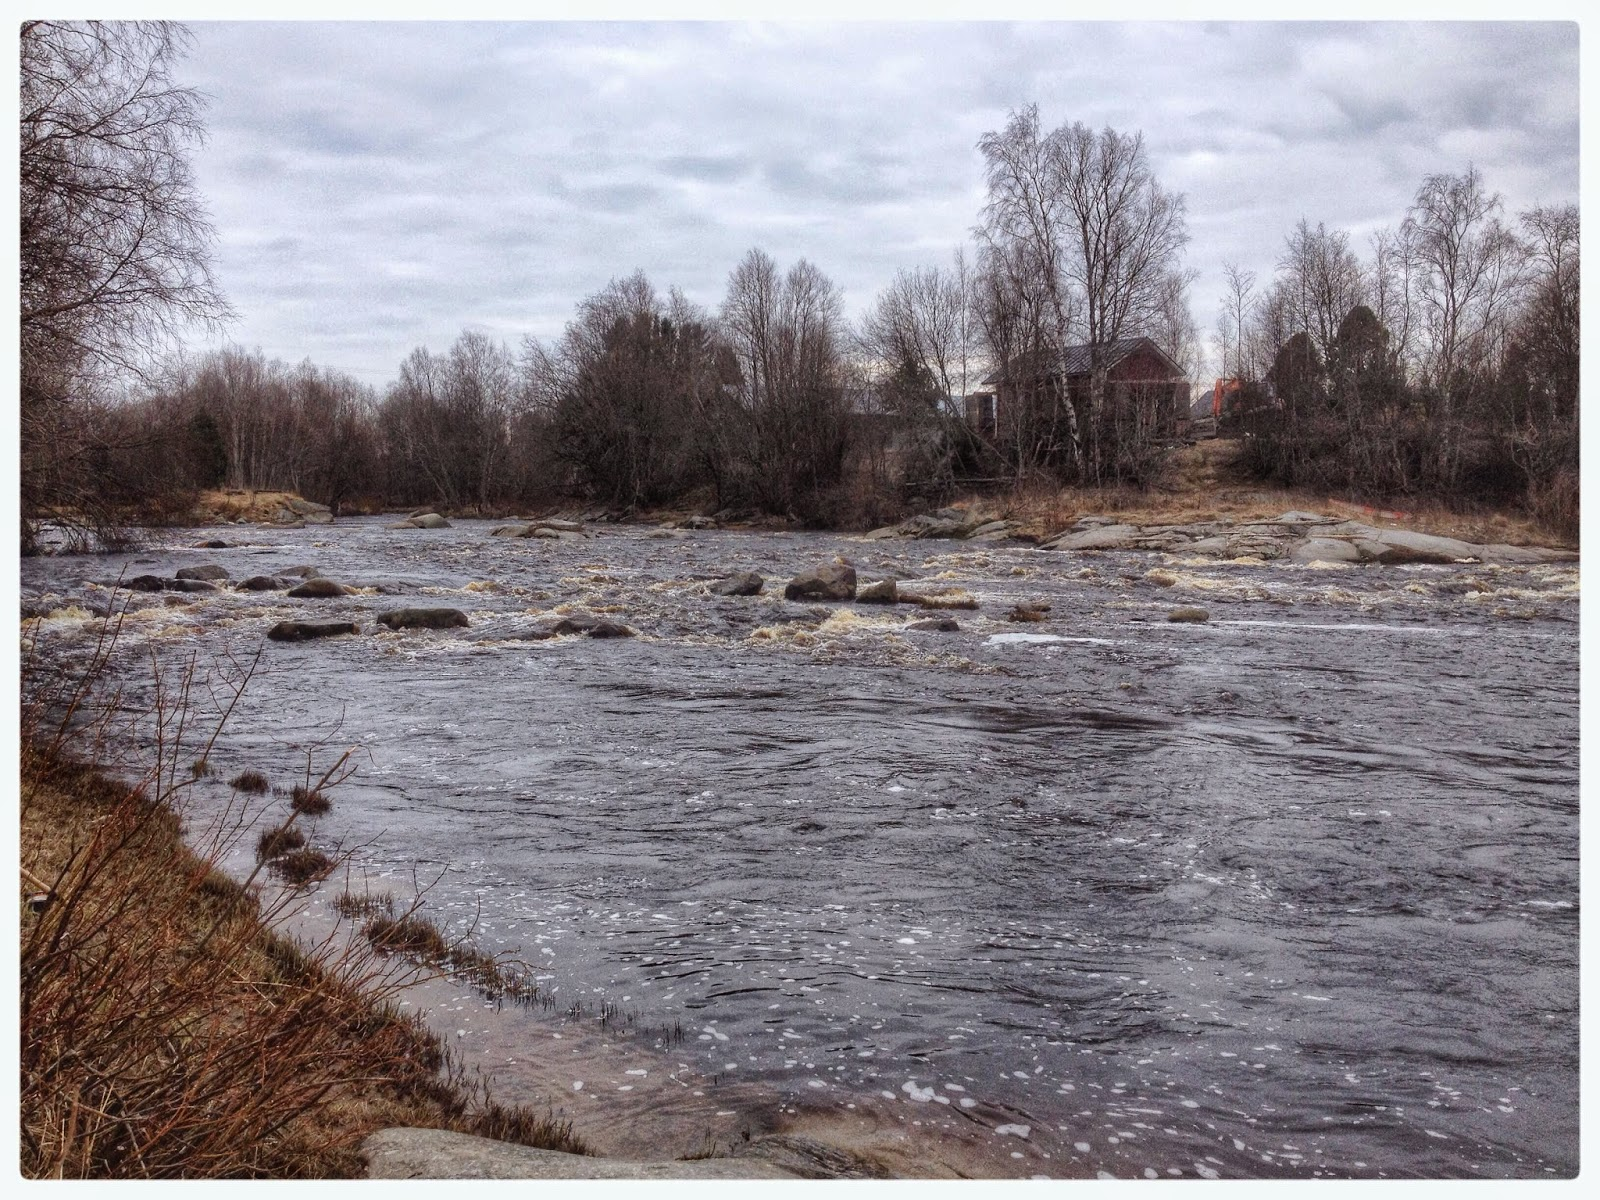 Lapväärtinjoki